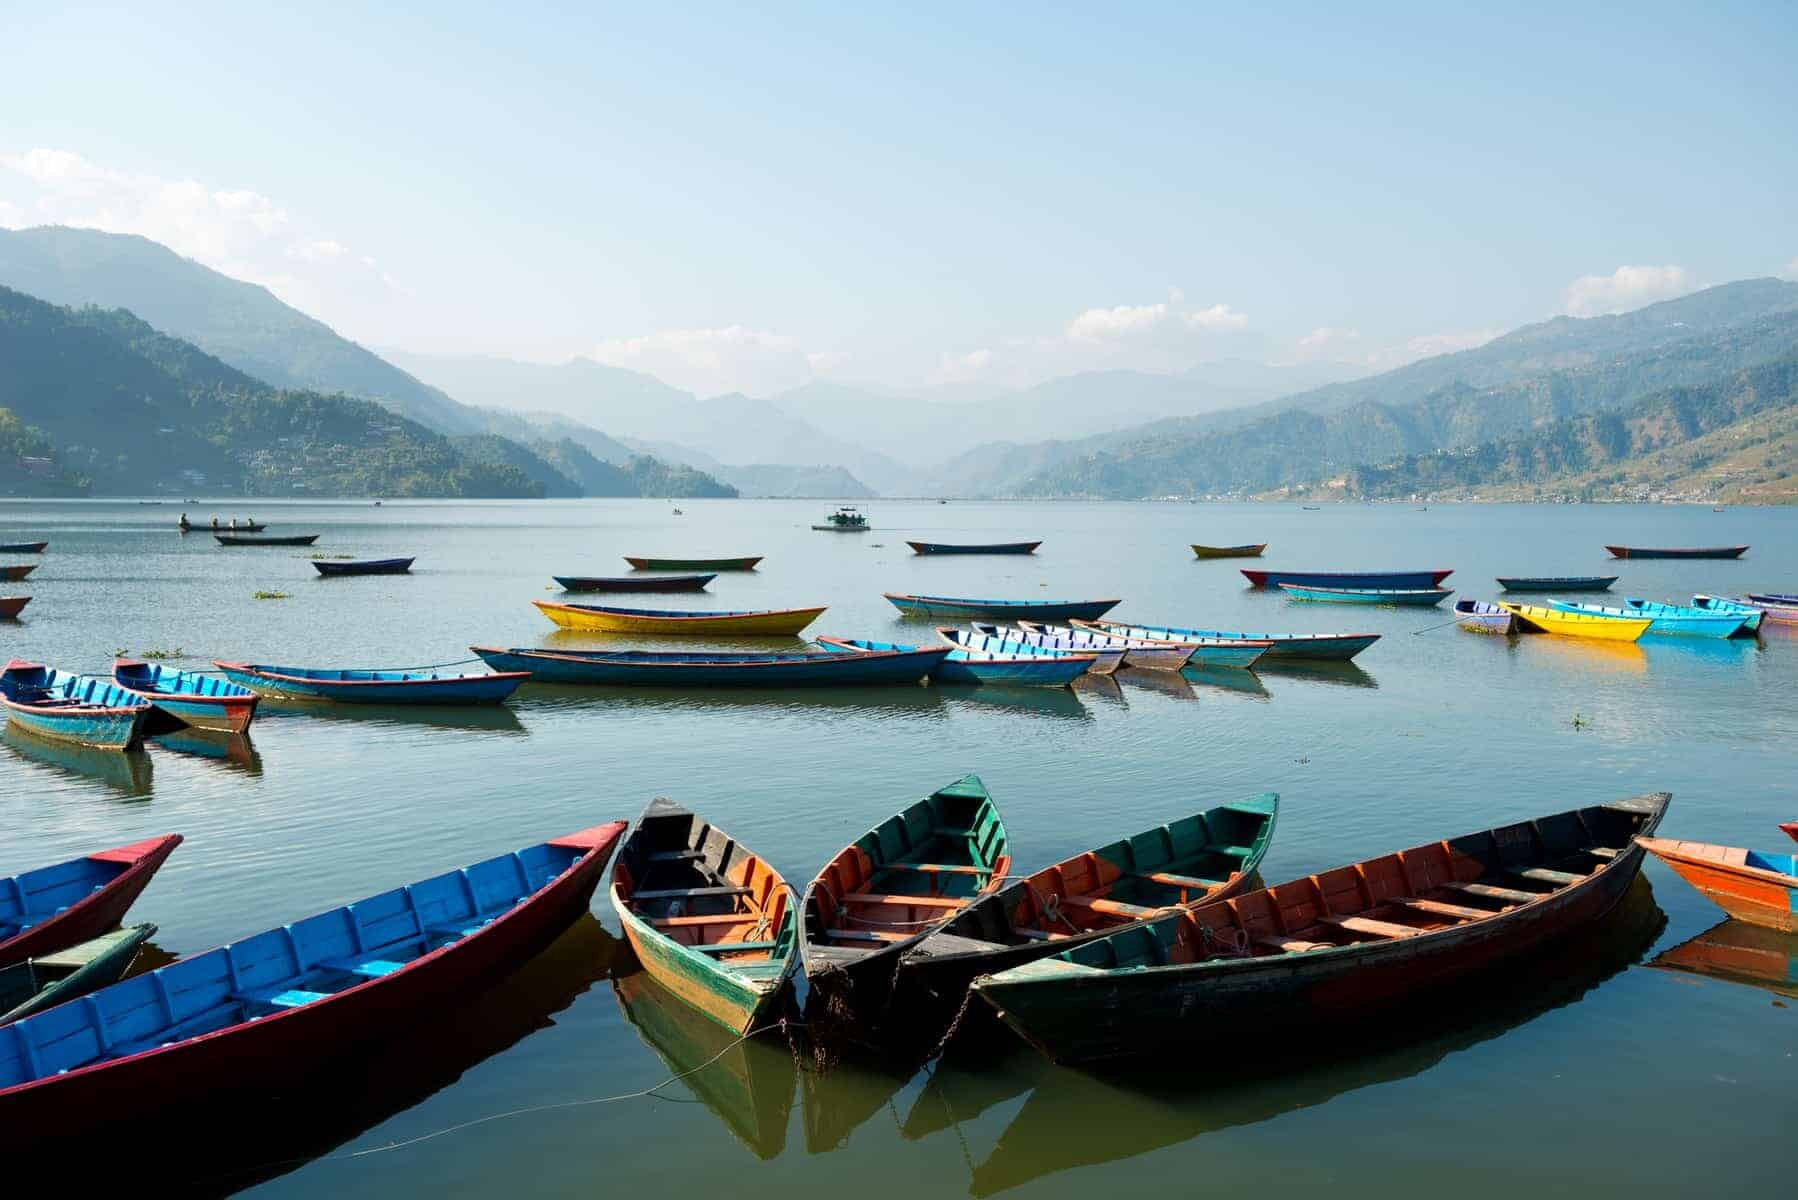 Pokhara, Nepal. Boat, still water